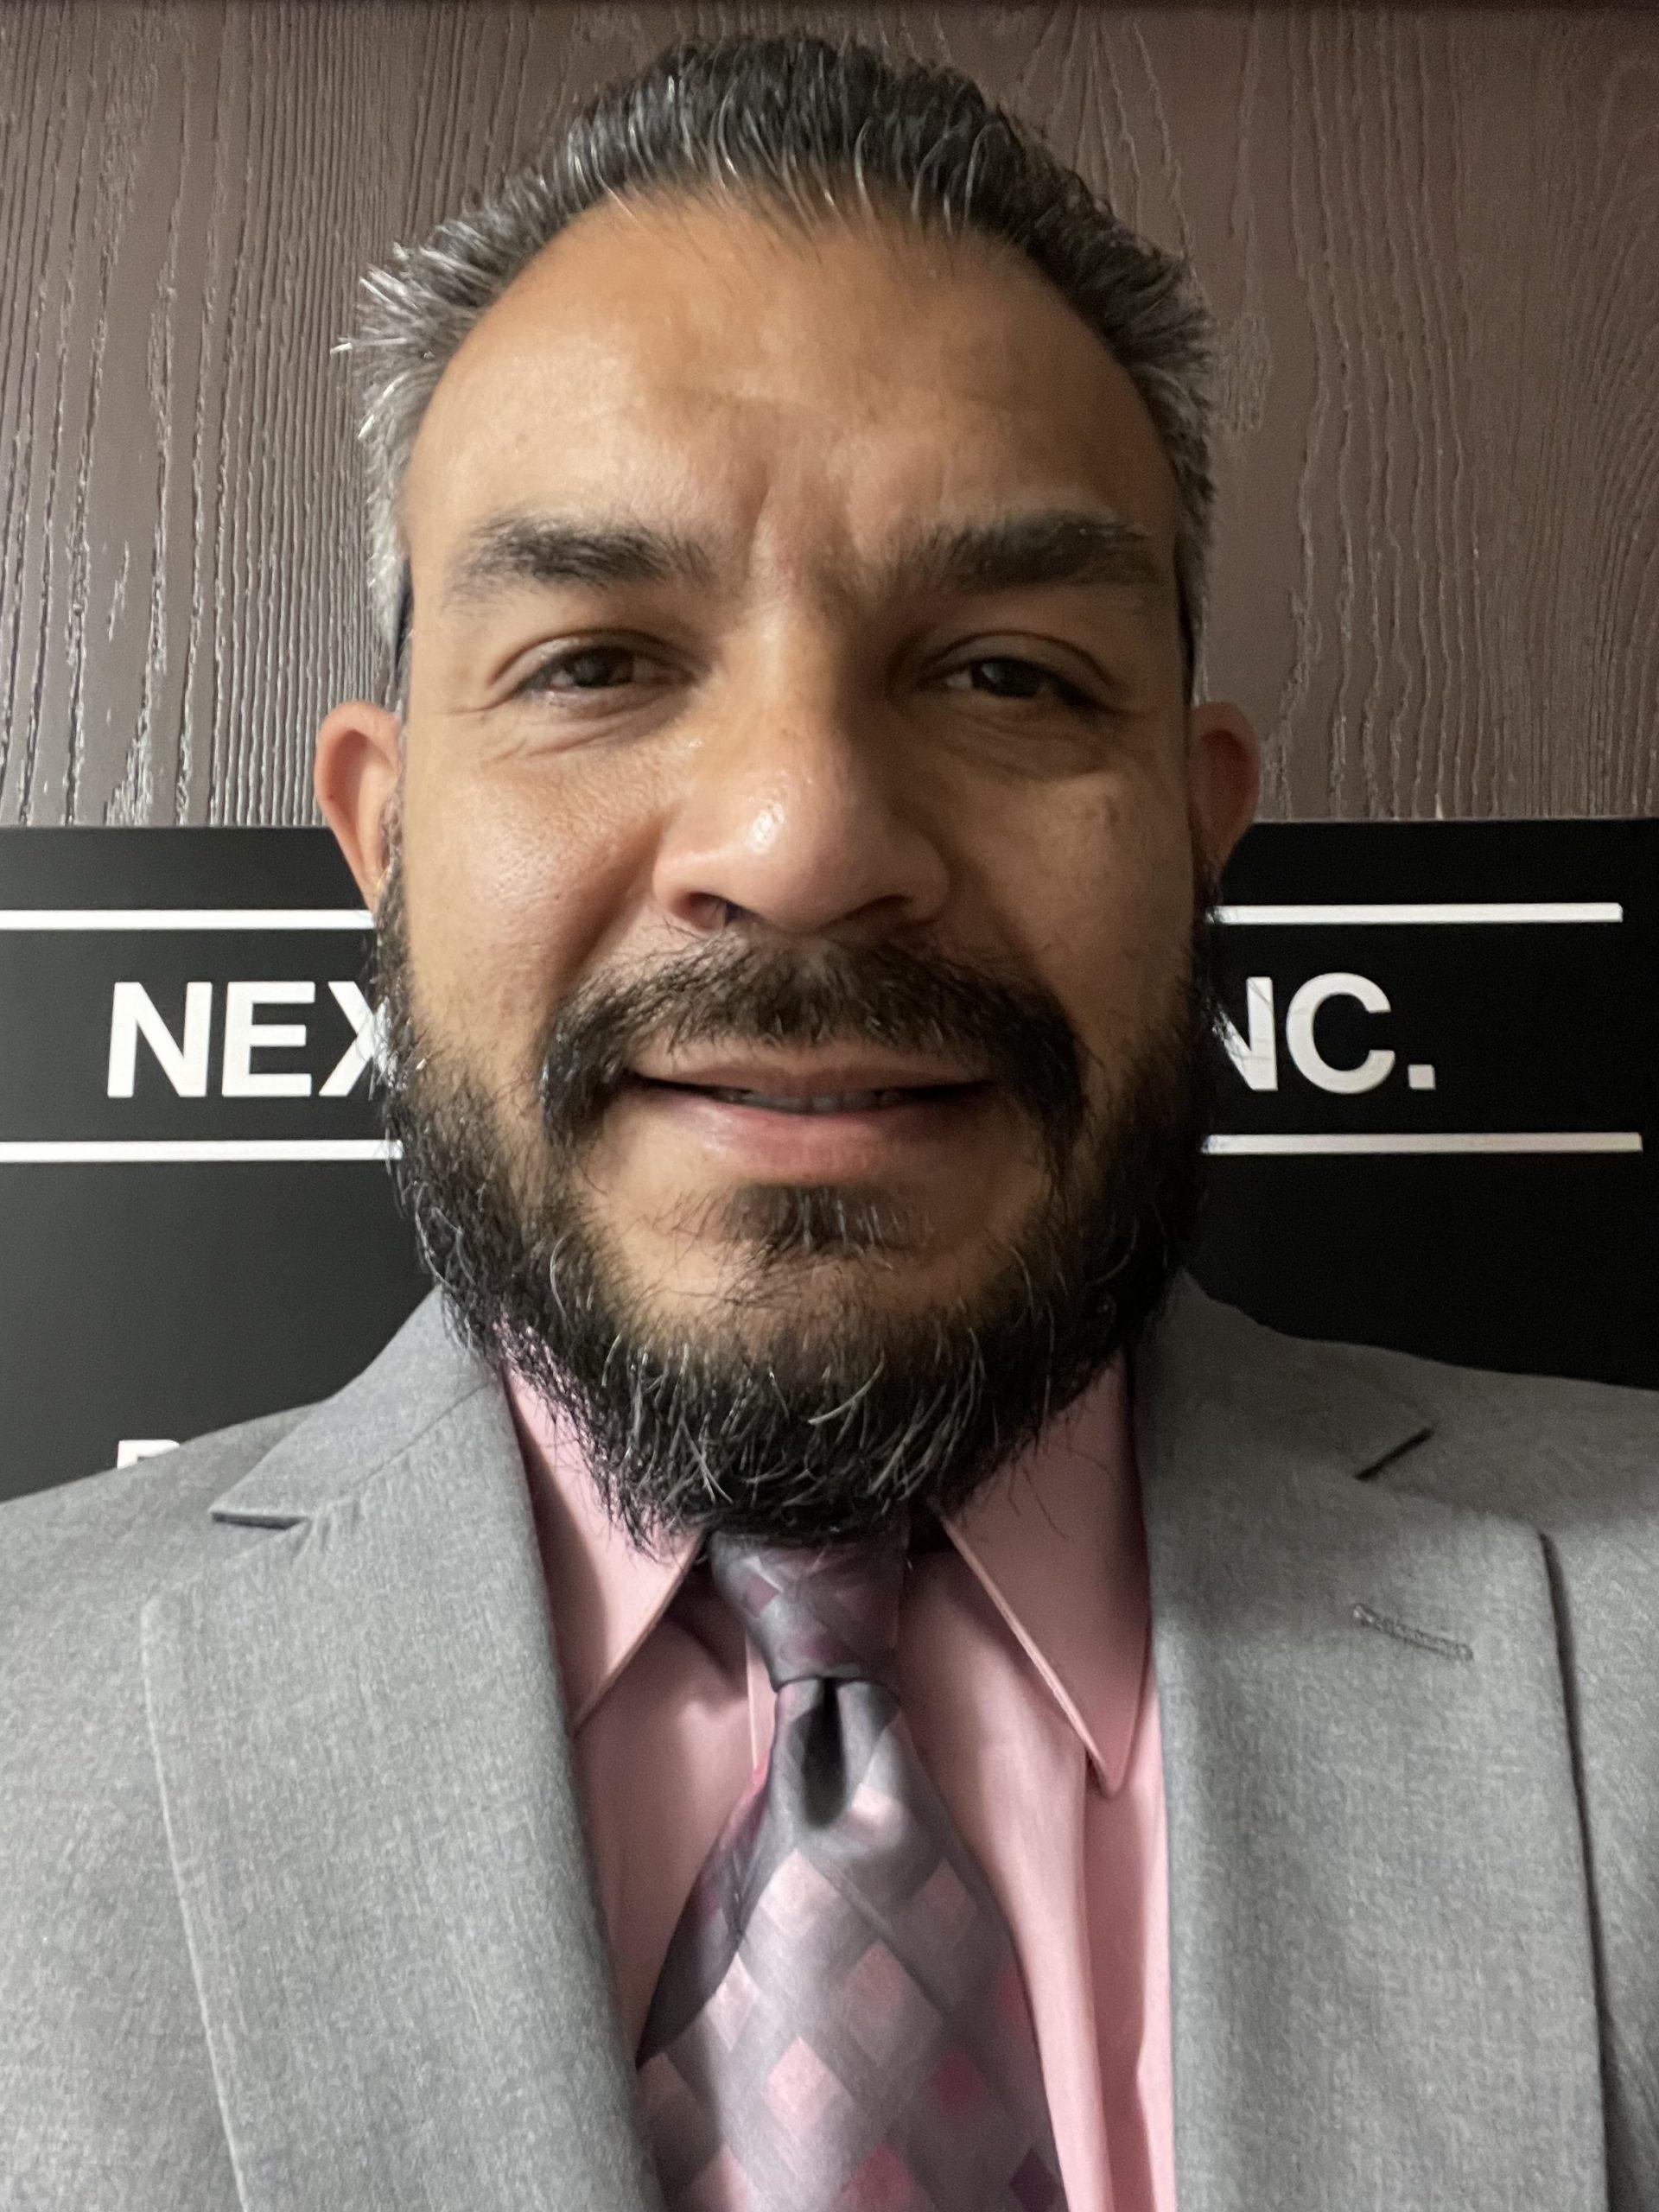 Eric R. Perez